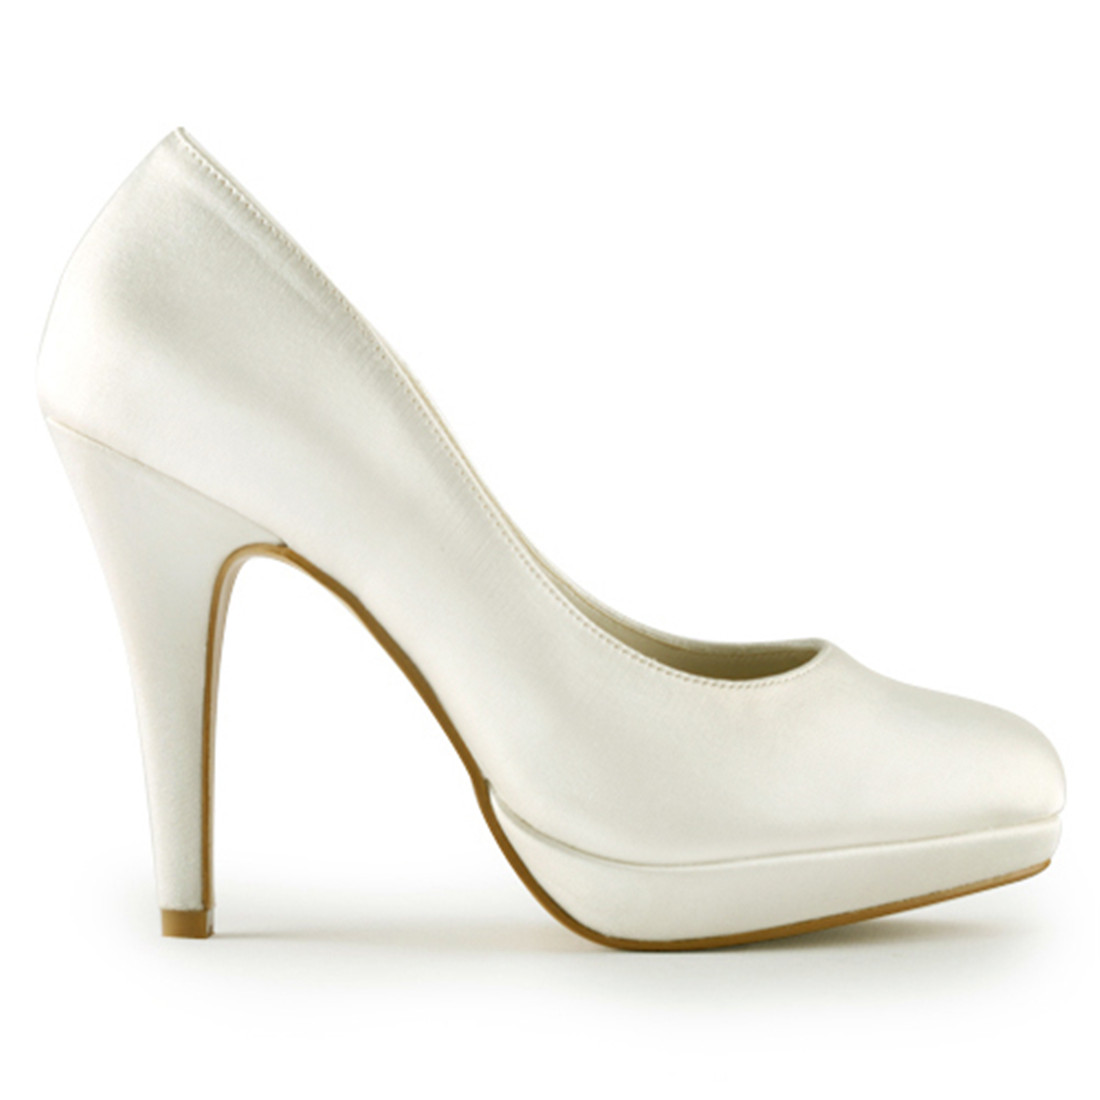 Elegantes tacones altos para novia dama de honor marfil blanco champán zapatos de plataforma de satén de lujo zapatos de boda Uninnova 521 1 LY - 4